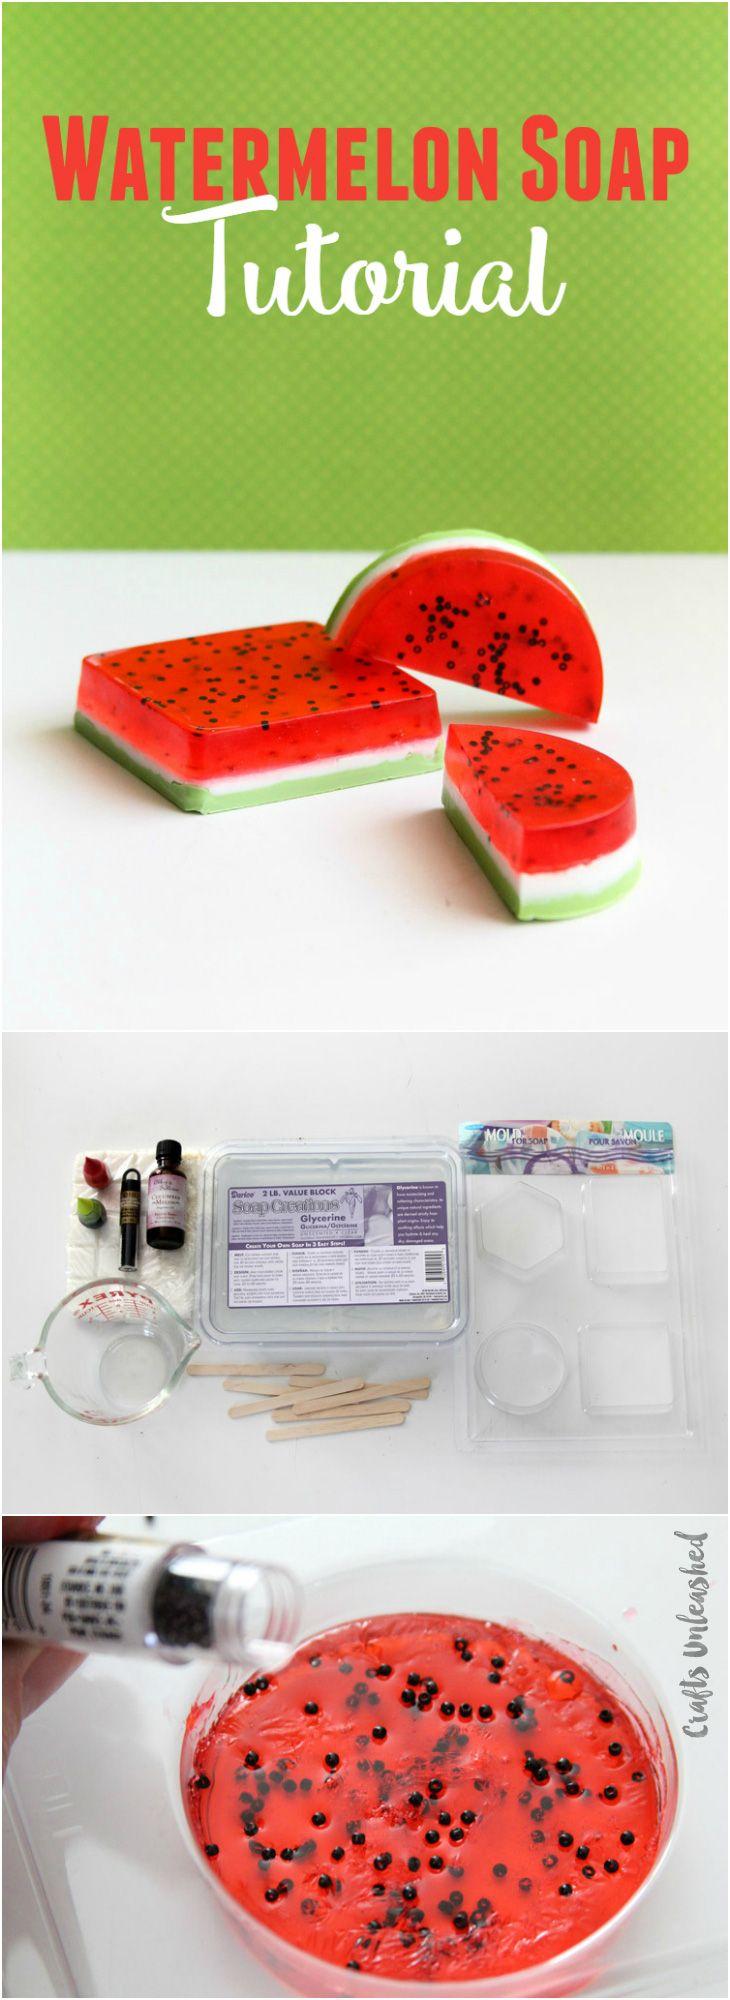 DIY Watermelon Soap Recipe